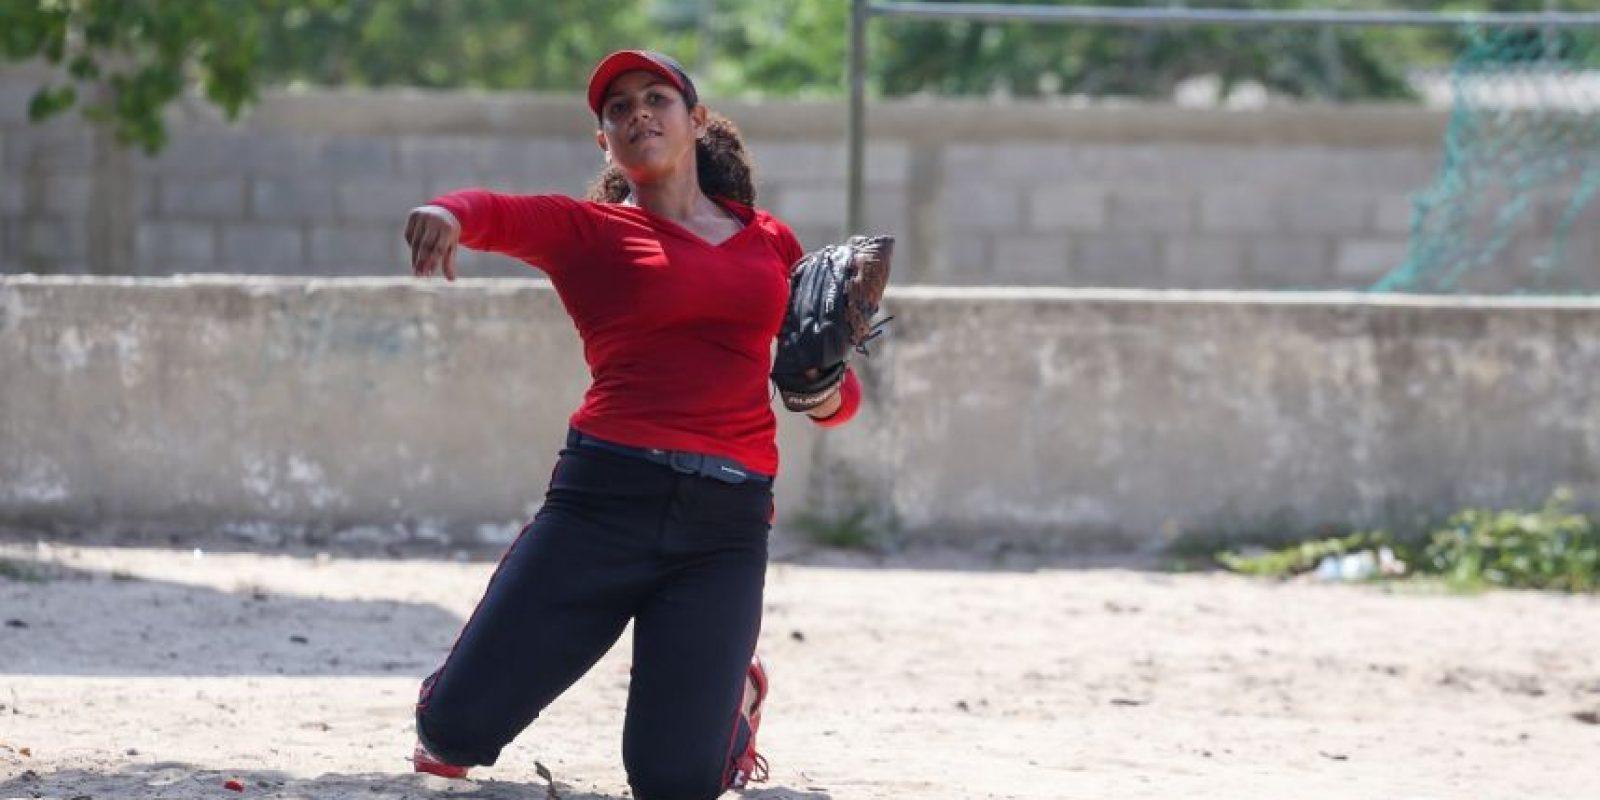 Sofbolista, Mayra Vidal Foto:César Nigrinis Name